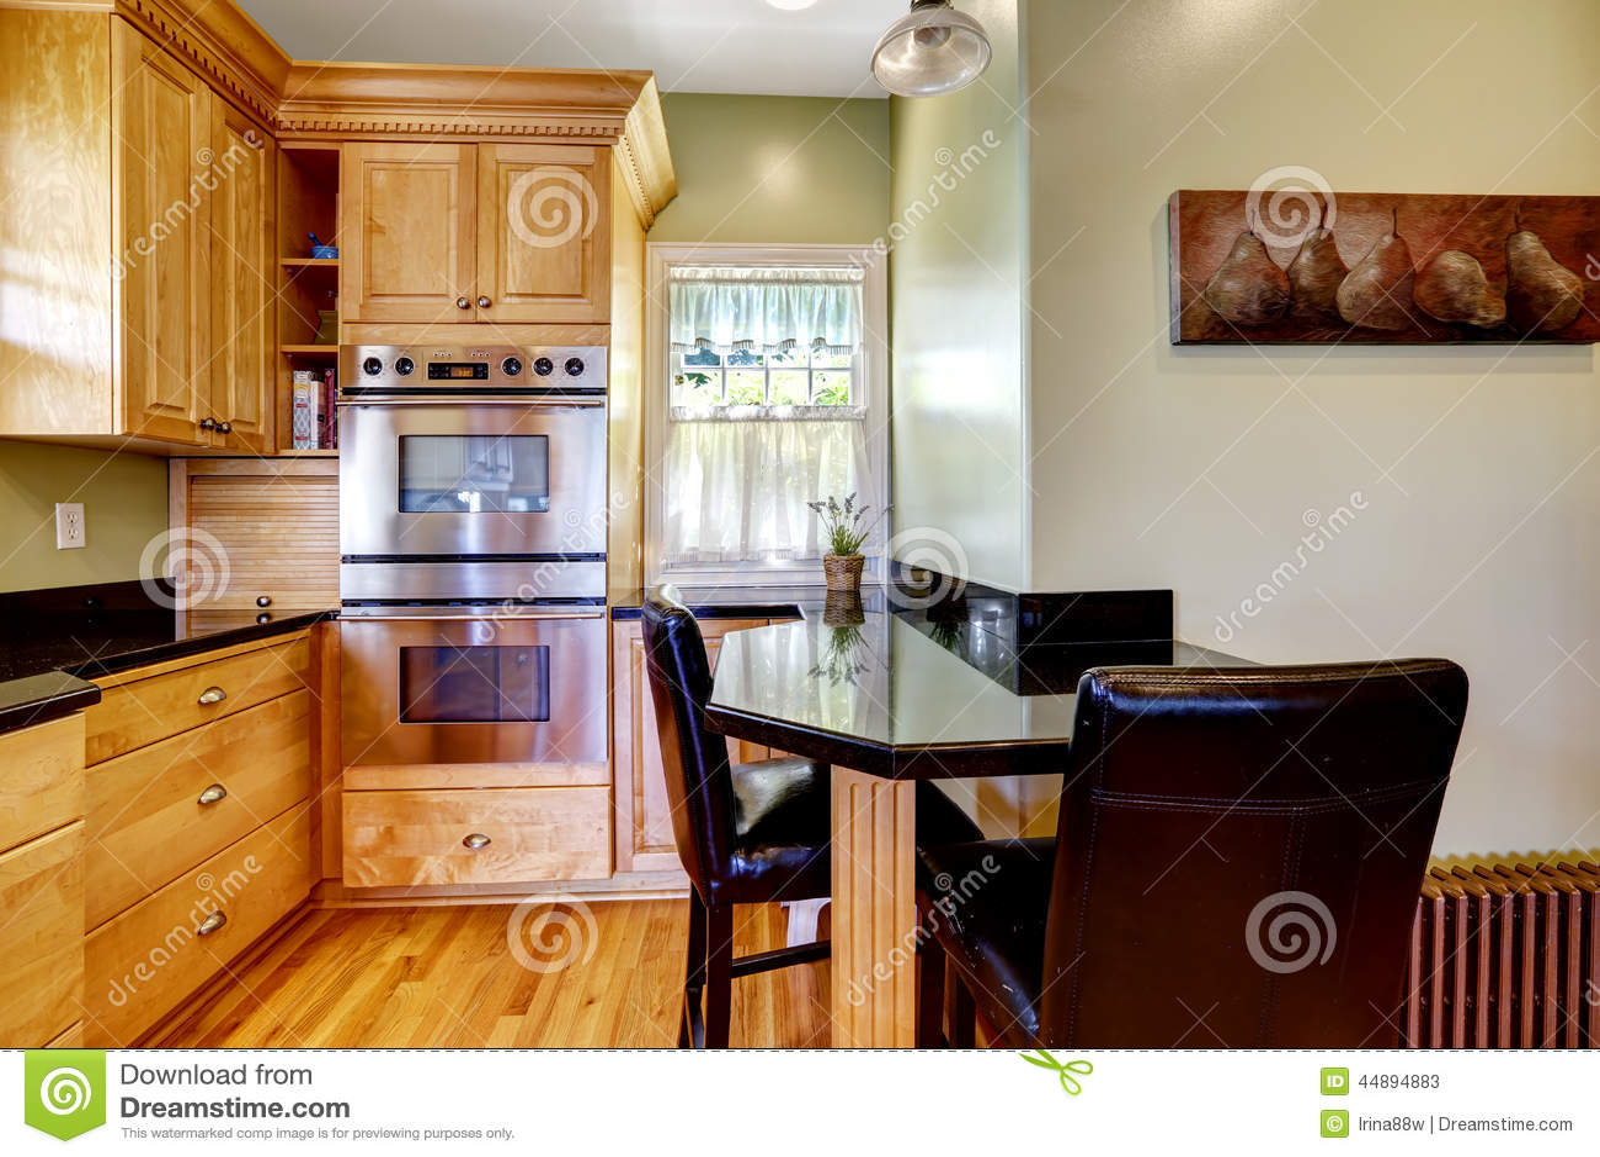 small kitchen table set cabinet ikea 光定调子有小餐桌和椅子的厨房室库存图片 图片包括有装备 木头 空间 光定调子有小餐桌和椅子的厨房室